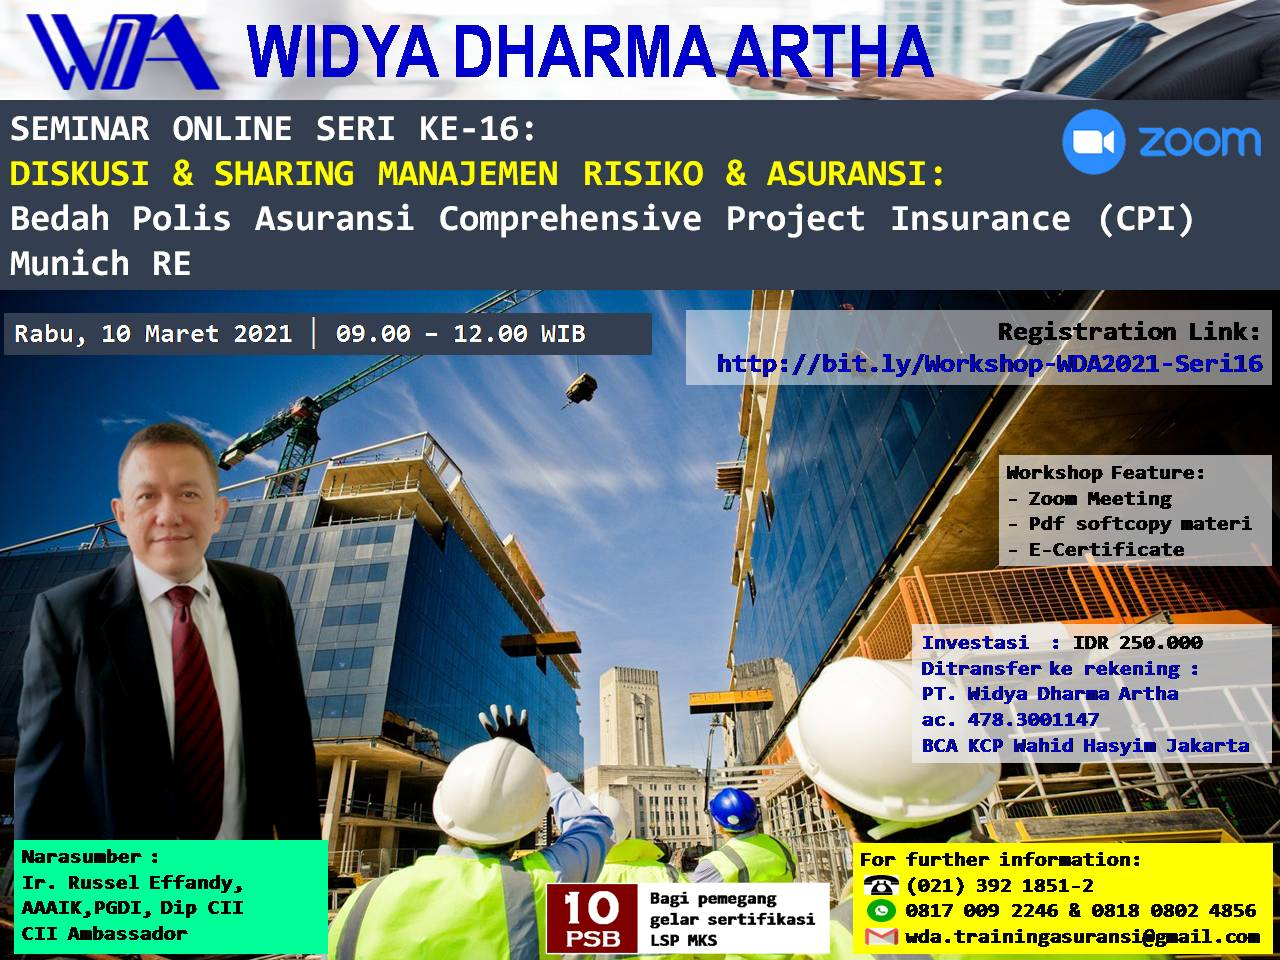 wda-pelatihan-online-polis-cpi-munich-re-rabu-10-maret-2021-0900-1200